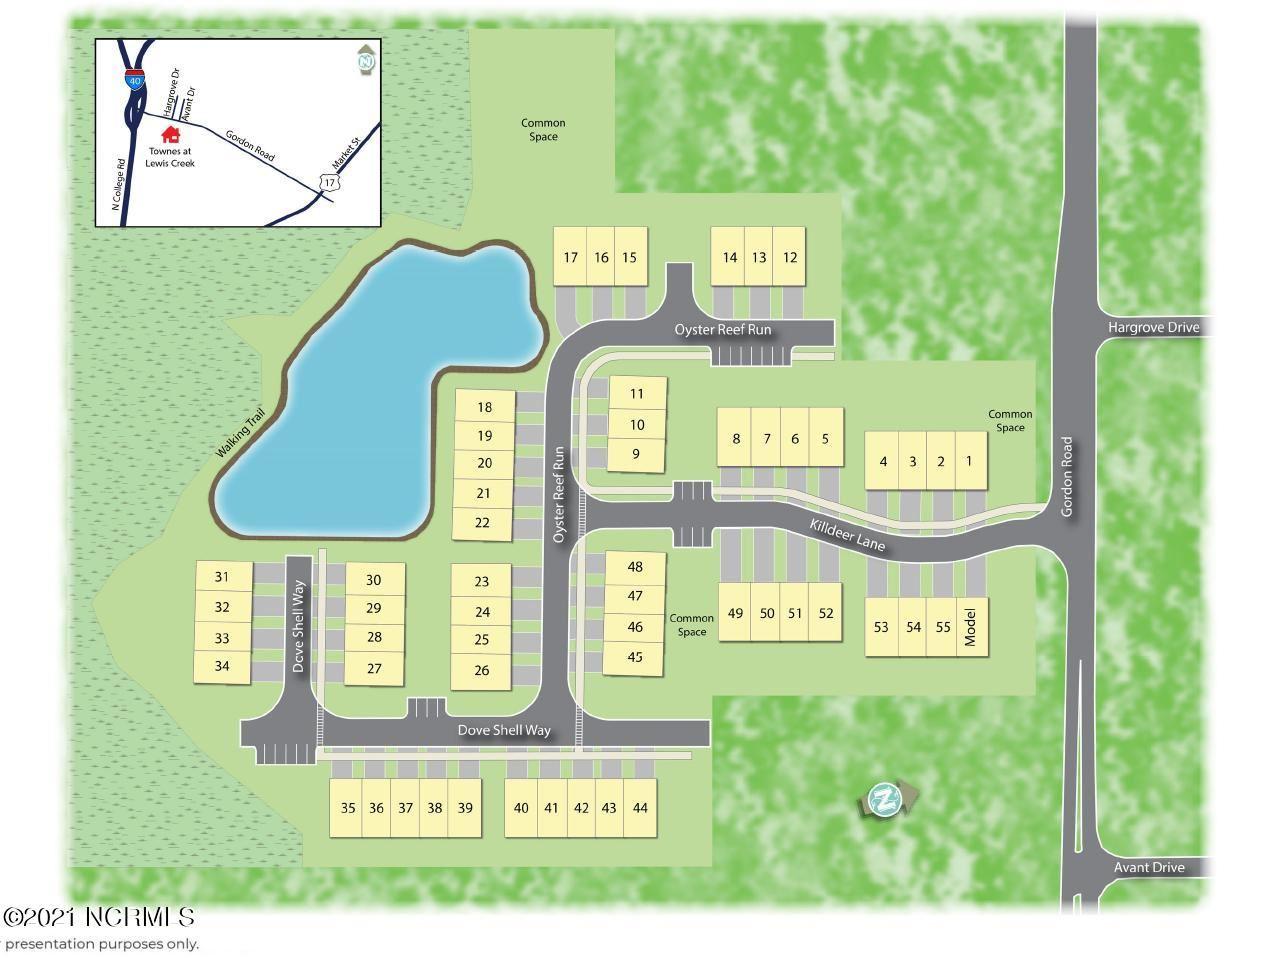 Photo of 1546 Dove Shell Way #Unit 44, Wilmington, NC 28411 (MLS # 100294321)